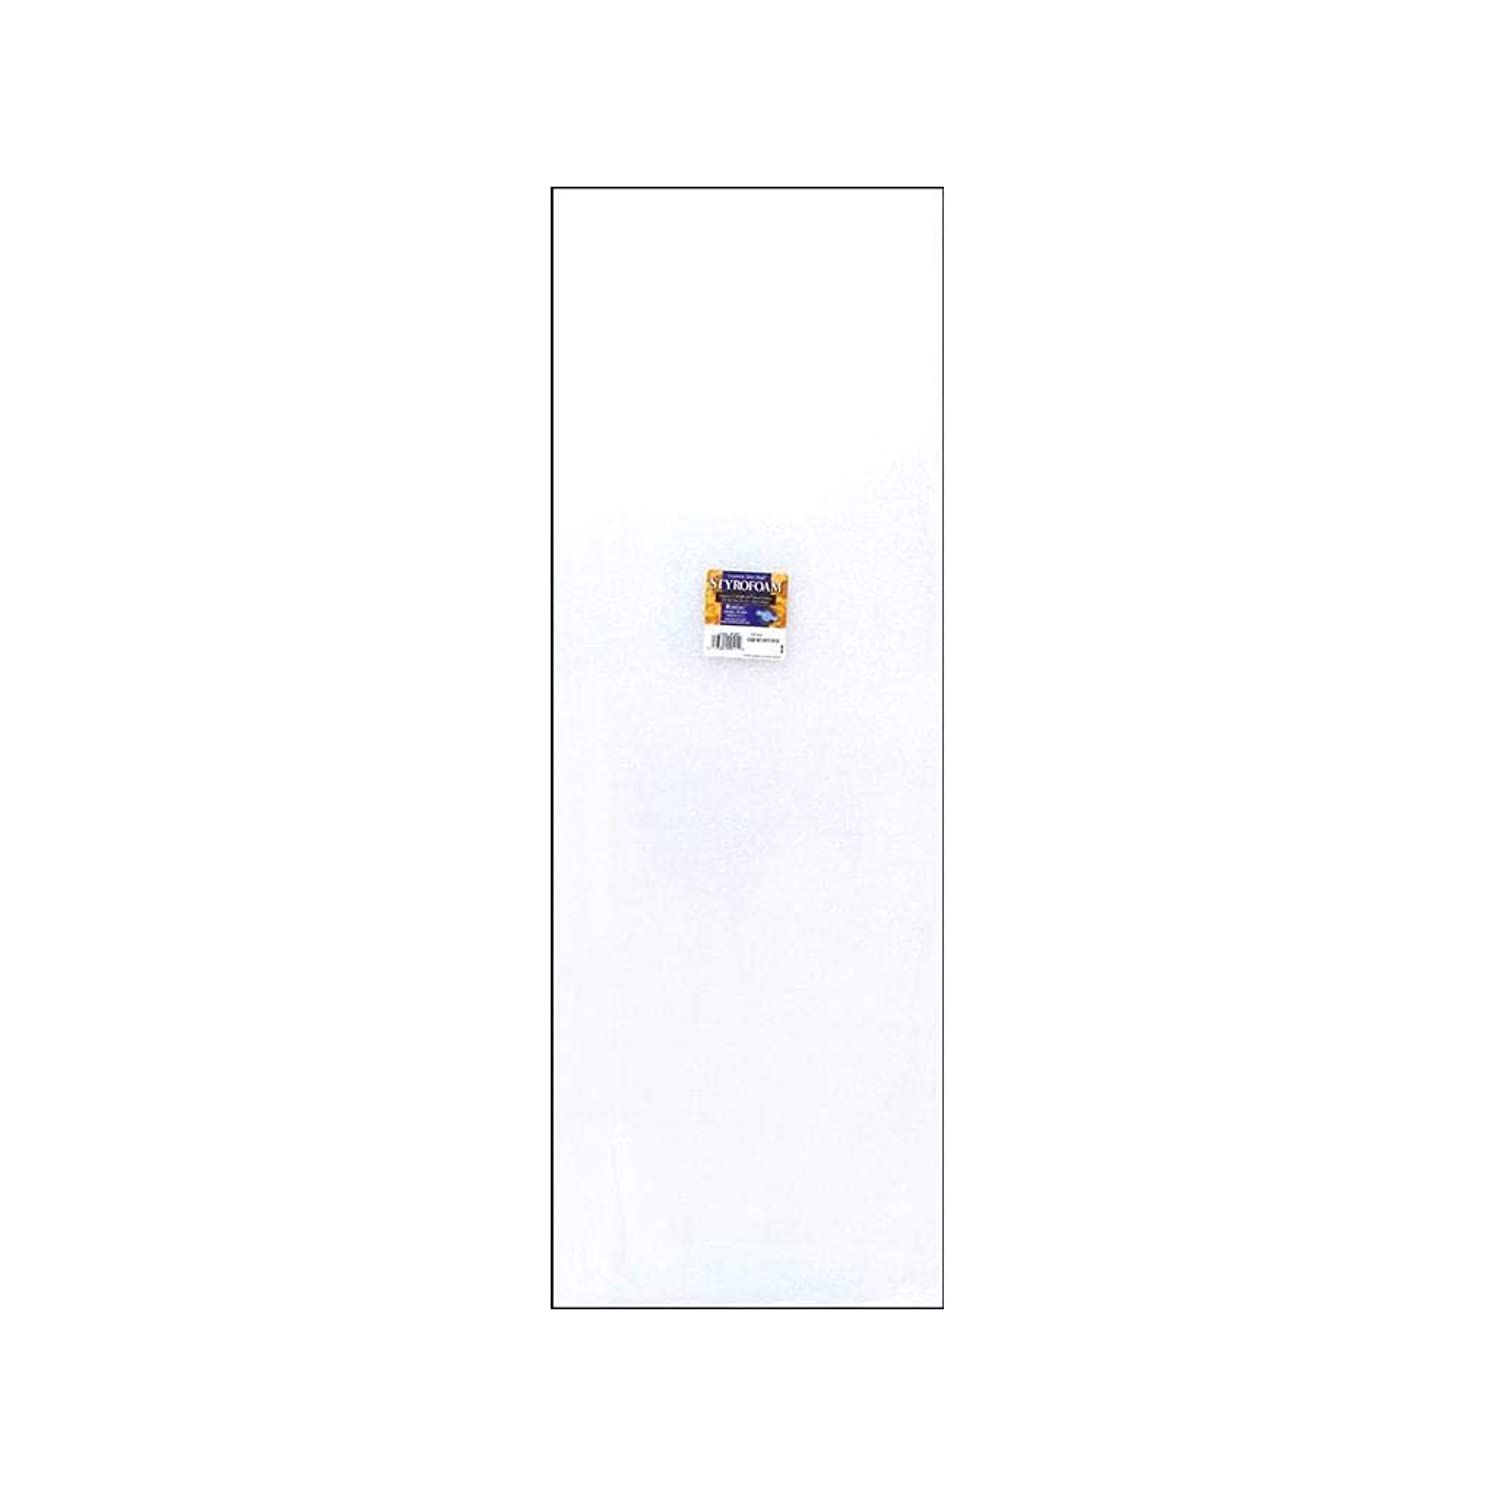 FloraCraft FLO20B1WS White Flora Craft Styrofoam Sheet Package, 1